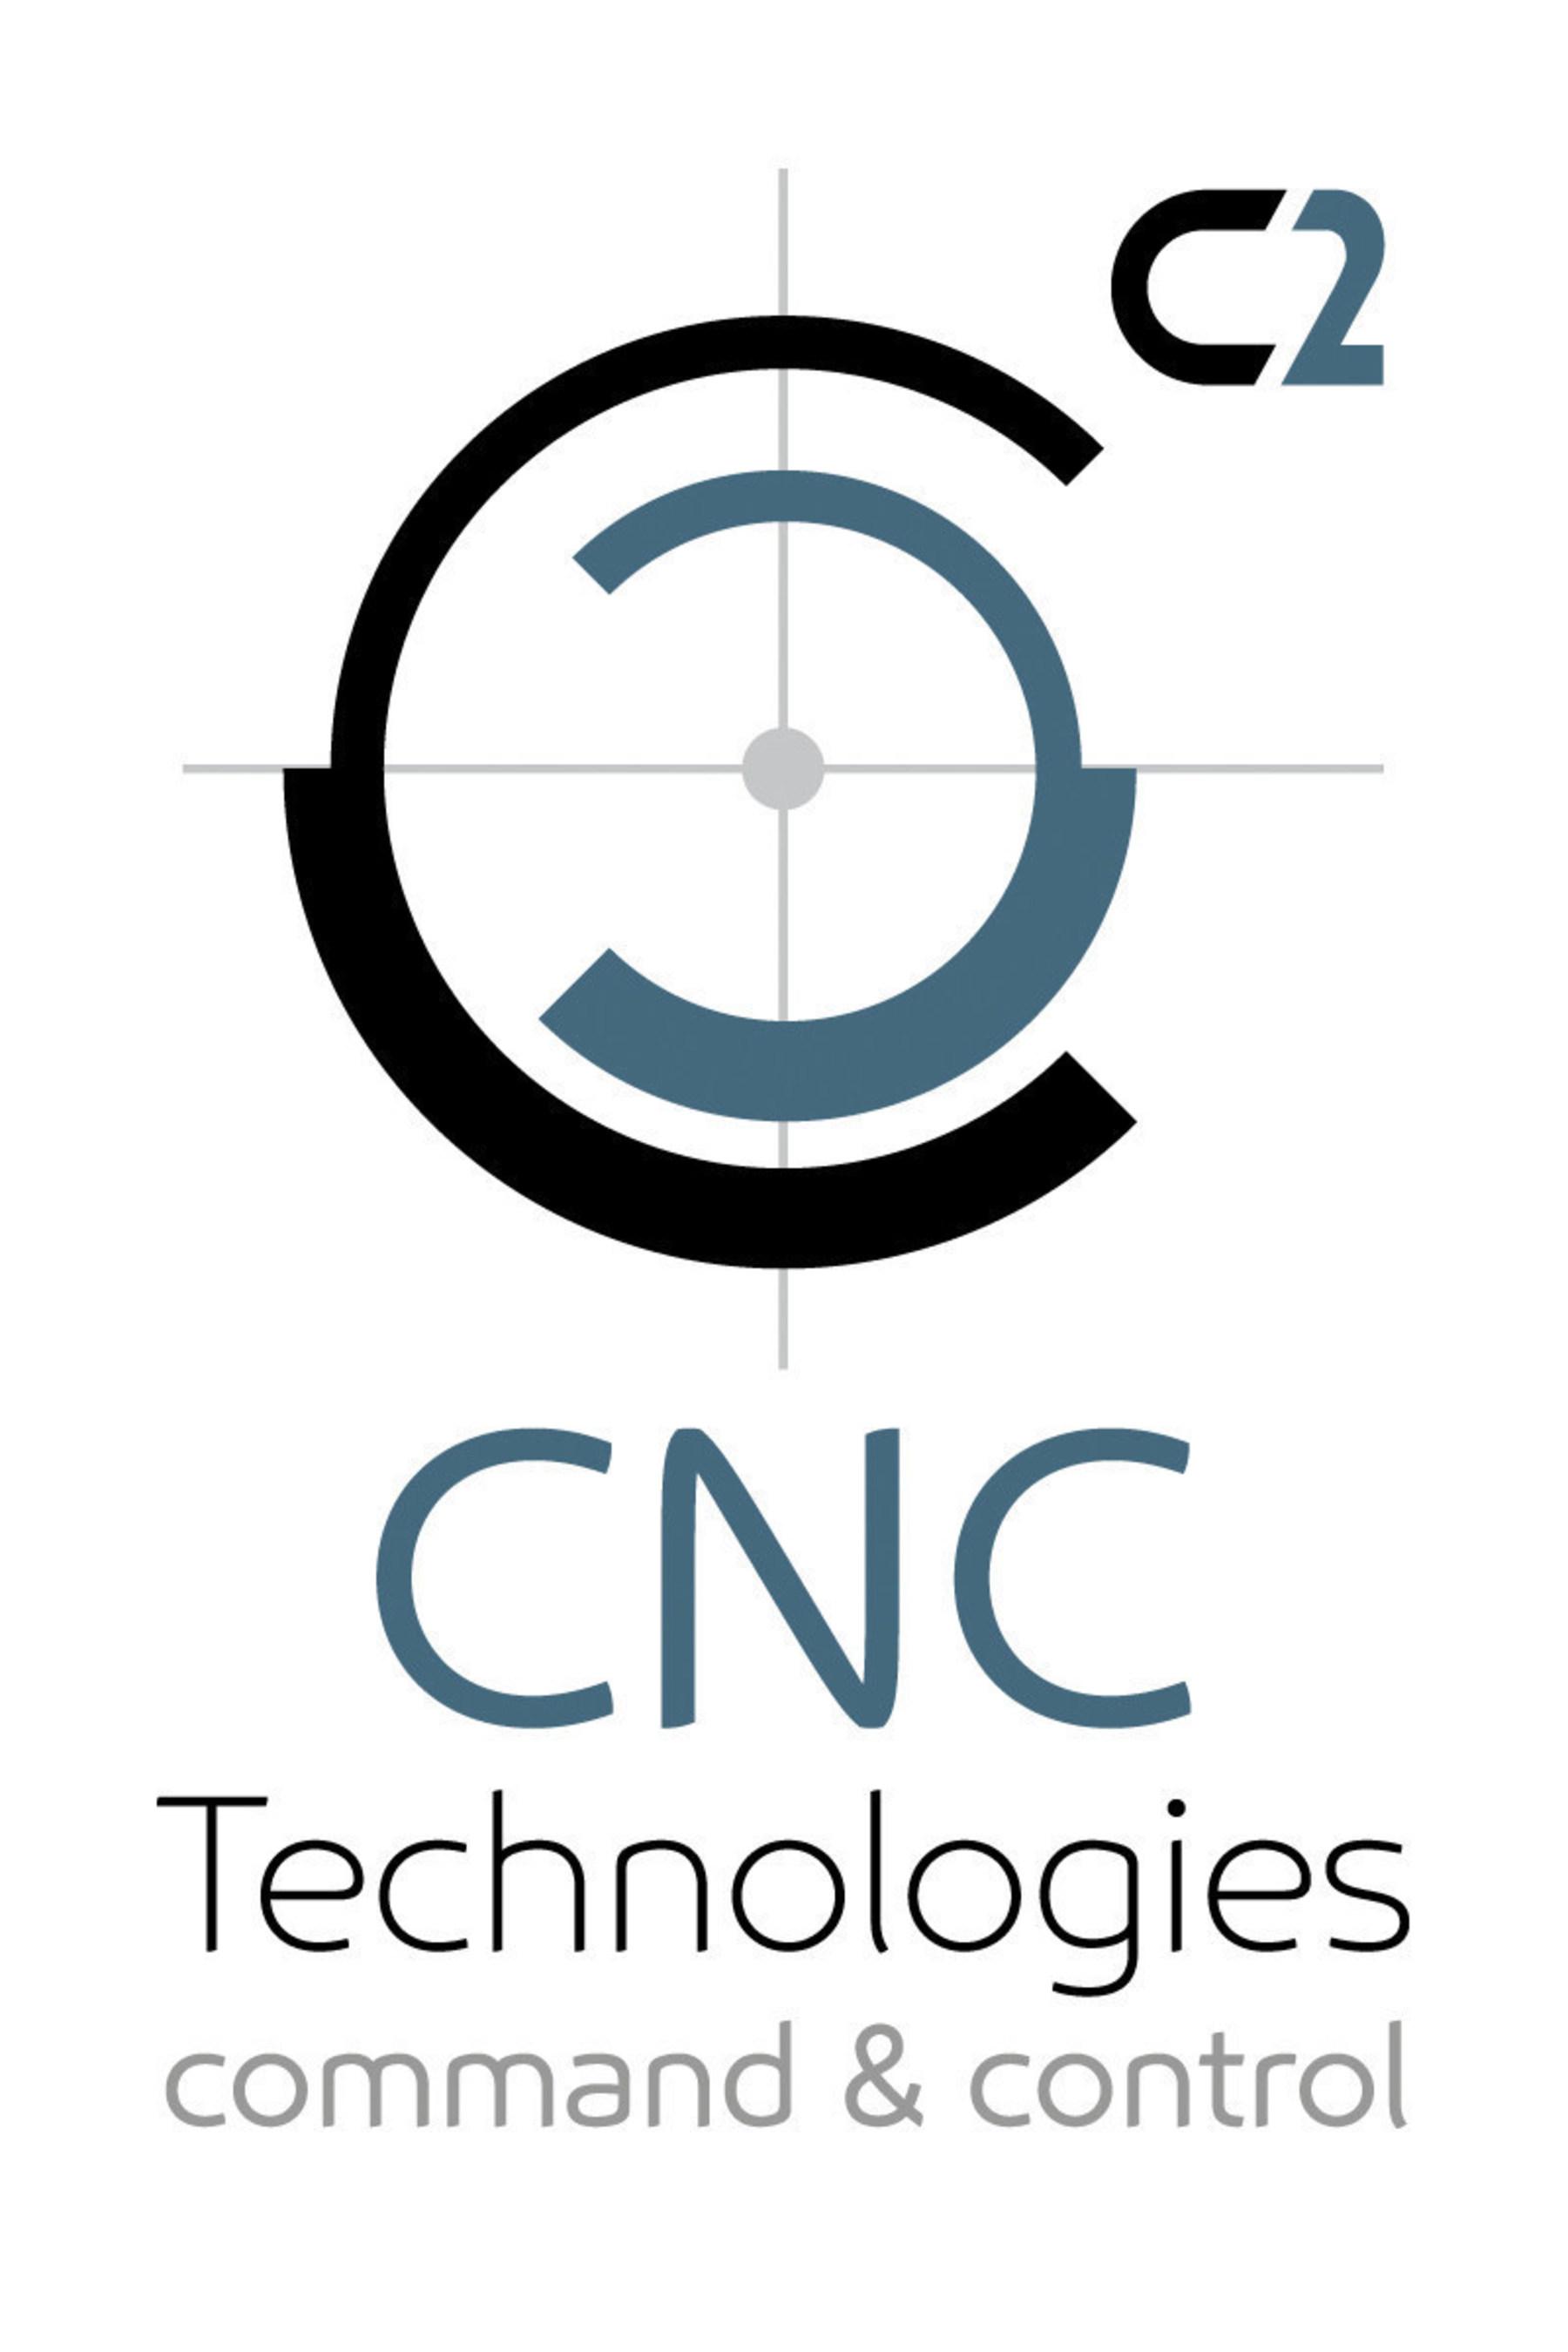 CNC Technologies